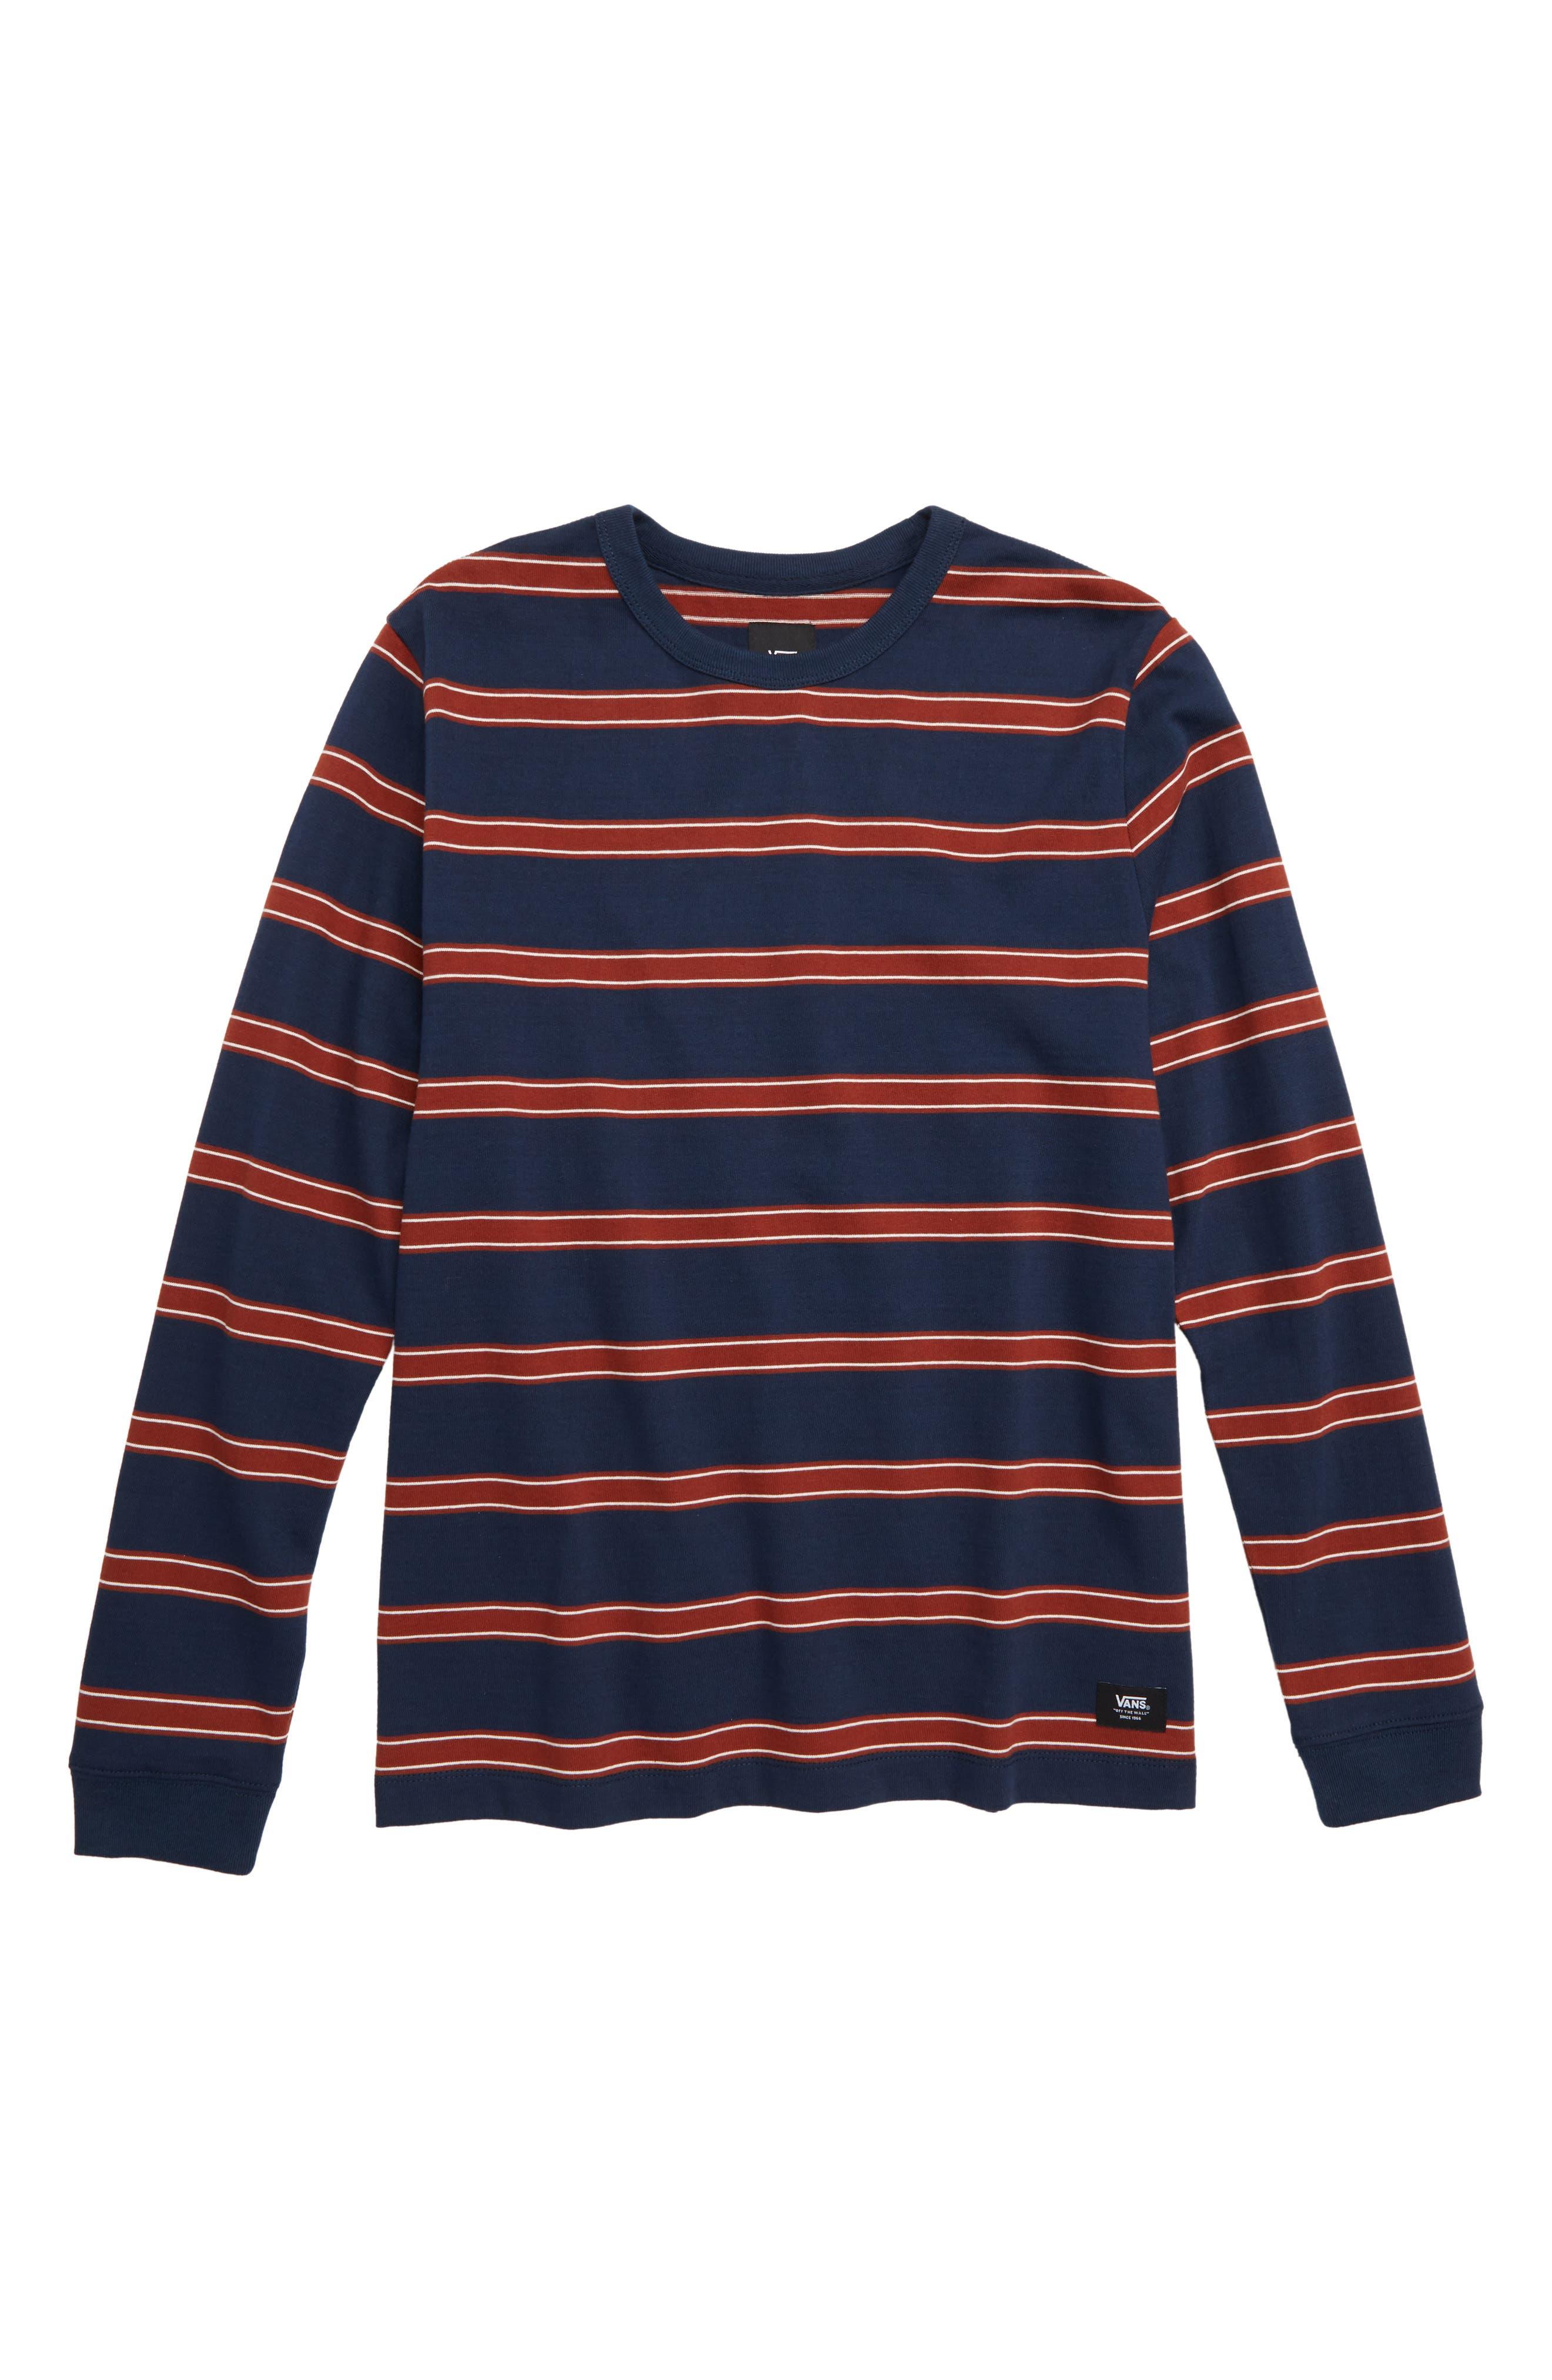 Watson Stripe Shirt,                             Main thumbnail 1, color,                             DRESS BLUES